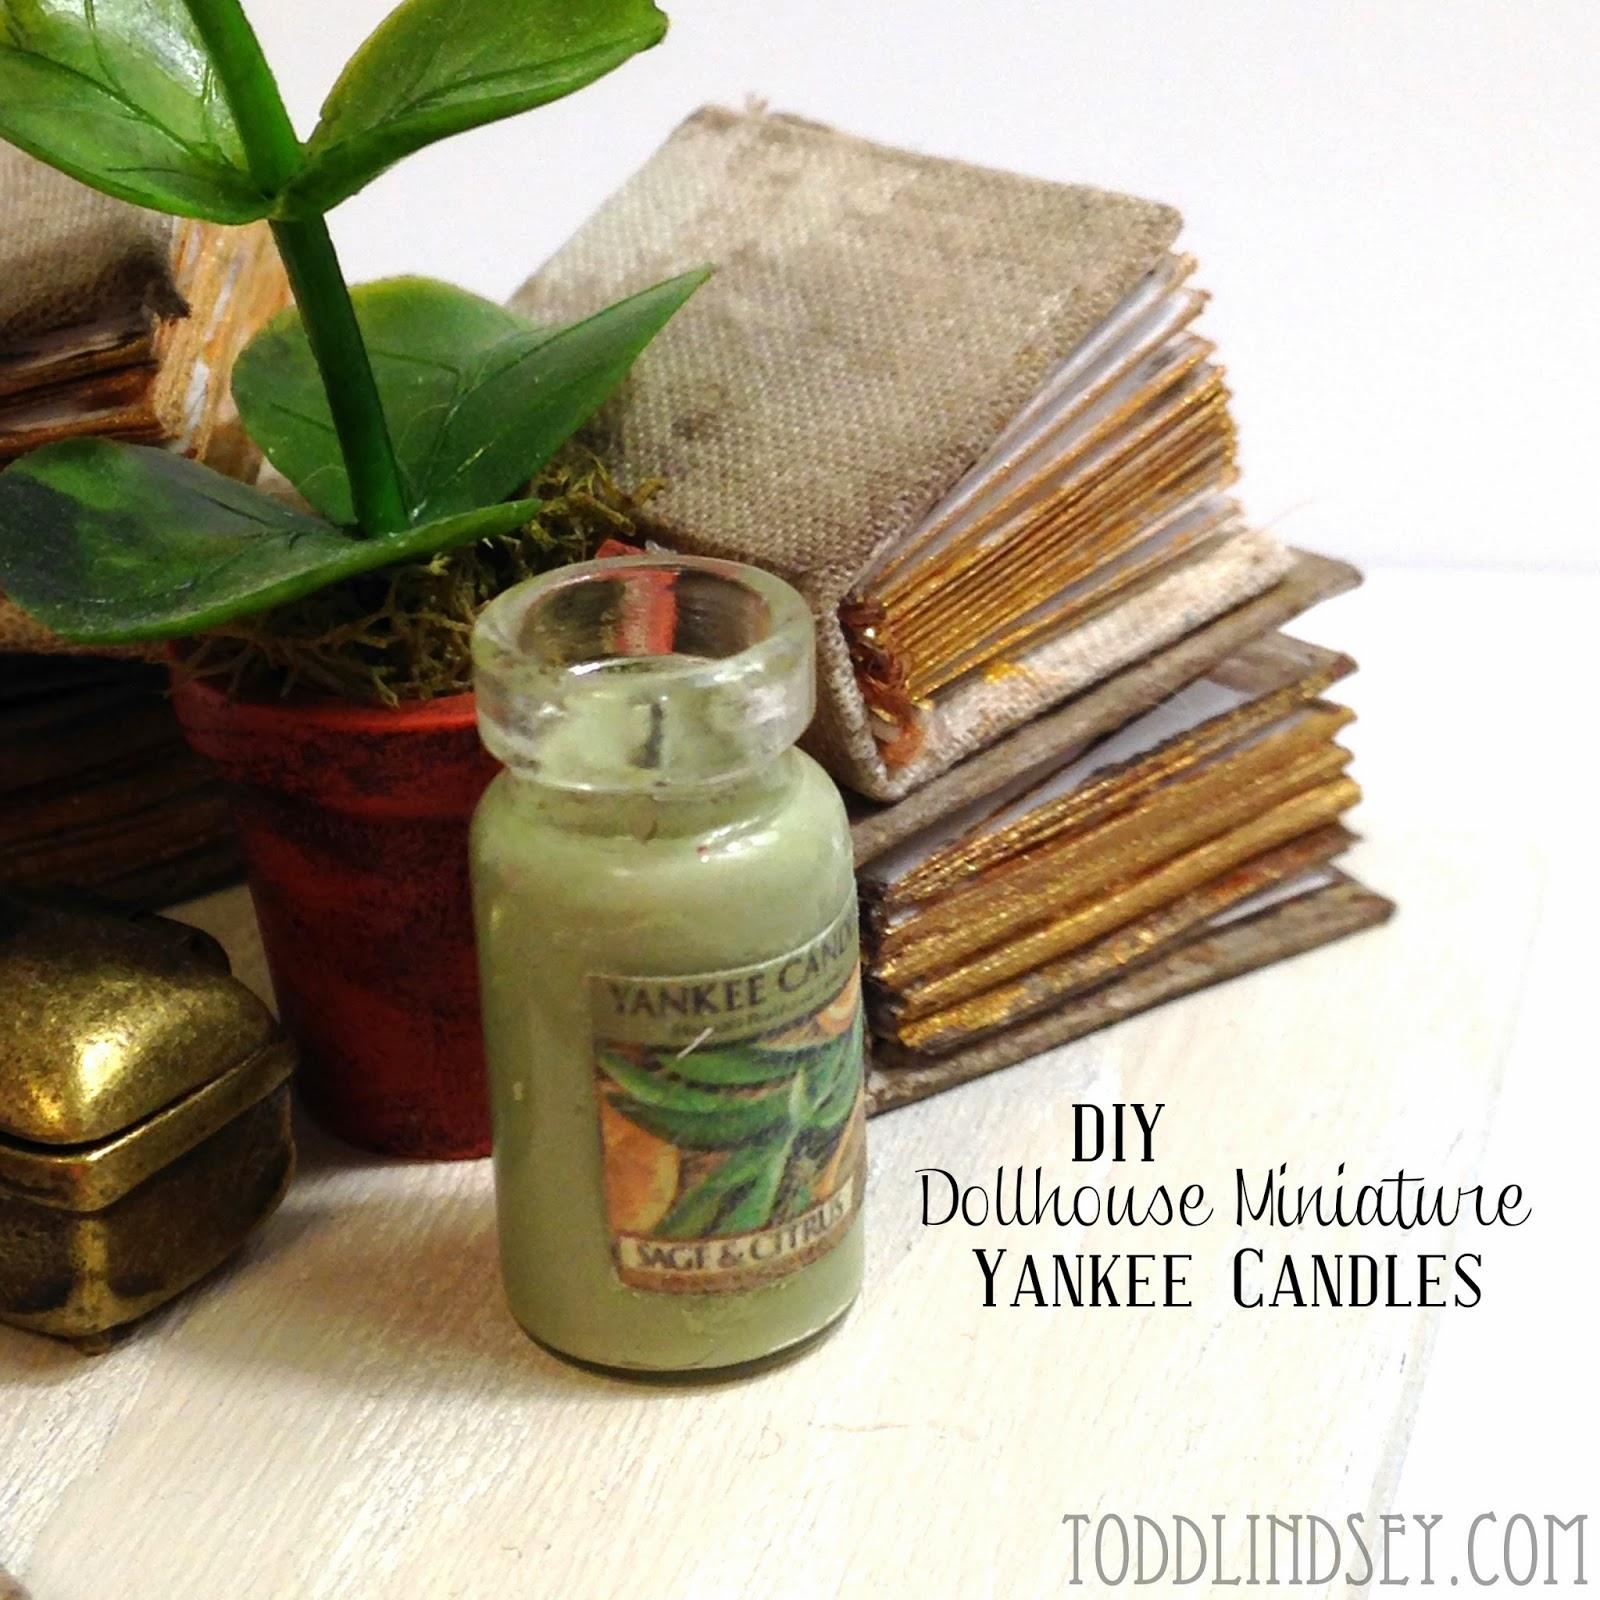 Domer Home: DIY DOLLHOUSE MINIATURE YANKEE CANDLES